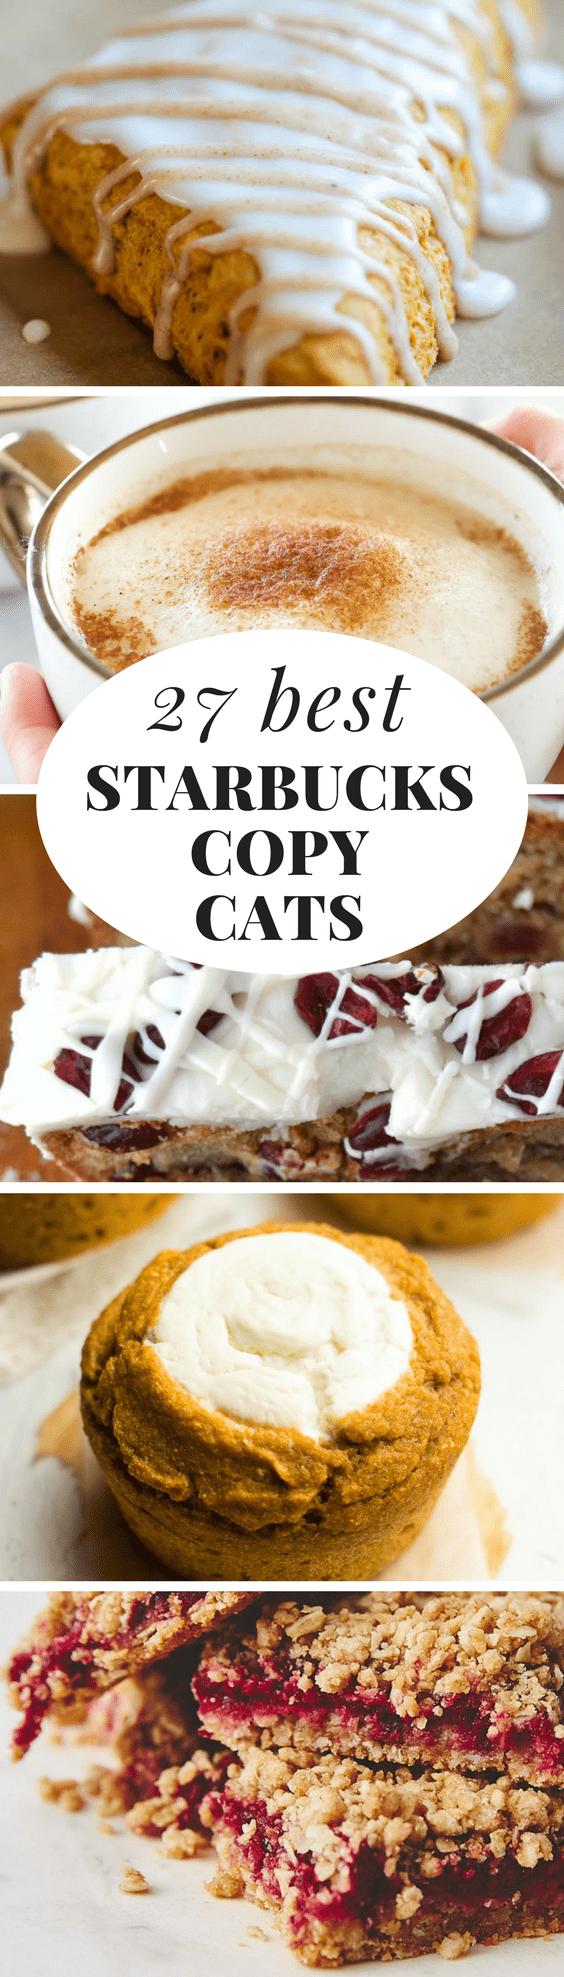 What to Make Now: Starbucks Copy Cat Recipes ~ here are the best 27 Starbucks copy cat recipes from lattes to lemon loaves...#starbucks #starbuckscopycatrecipe #copycat #coffee #poundcake #scones #croissants #muffins #cookies #brownies #roundup #fallrecipes #breakfast #brunch #latte #hotchocolate #lemoncake #pumpkin #pumpkinscones #bananabread